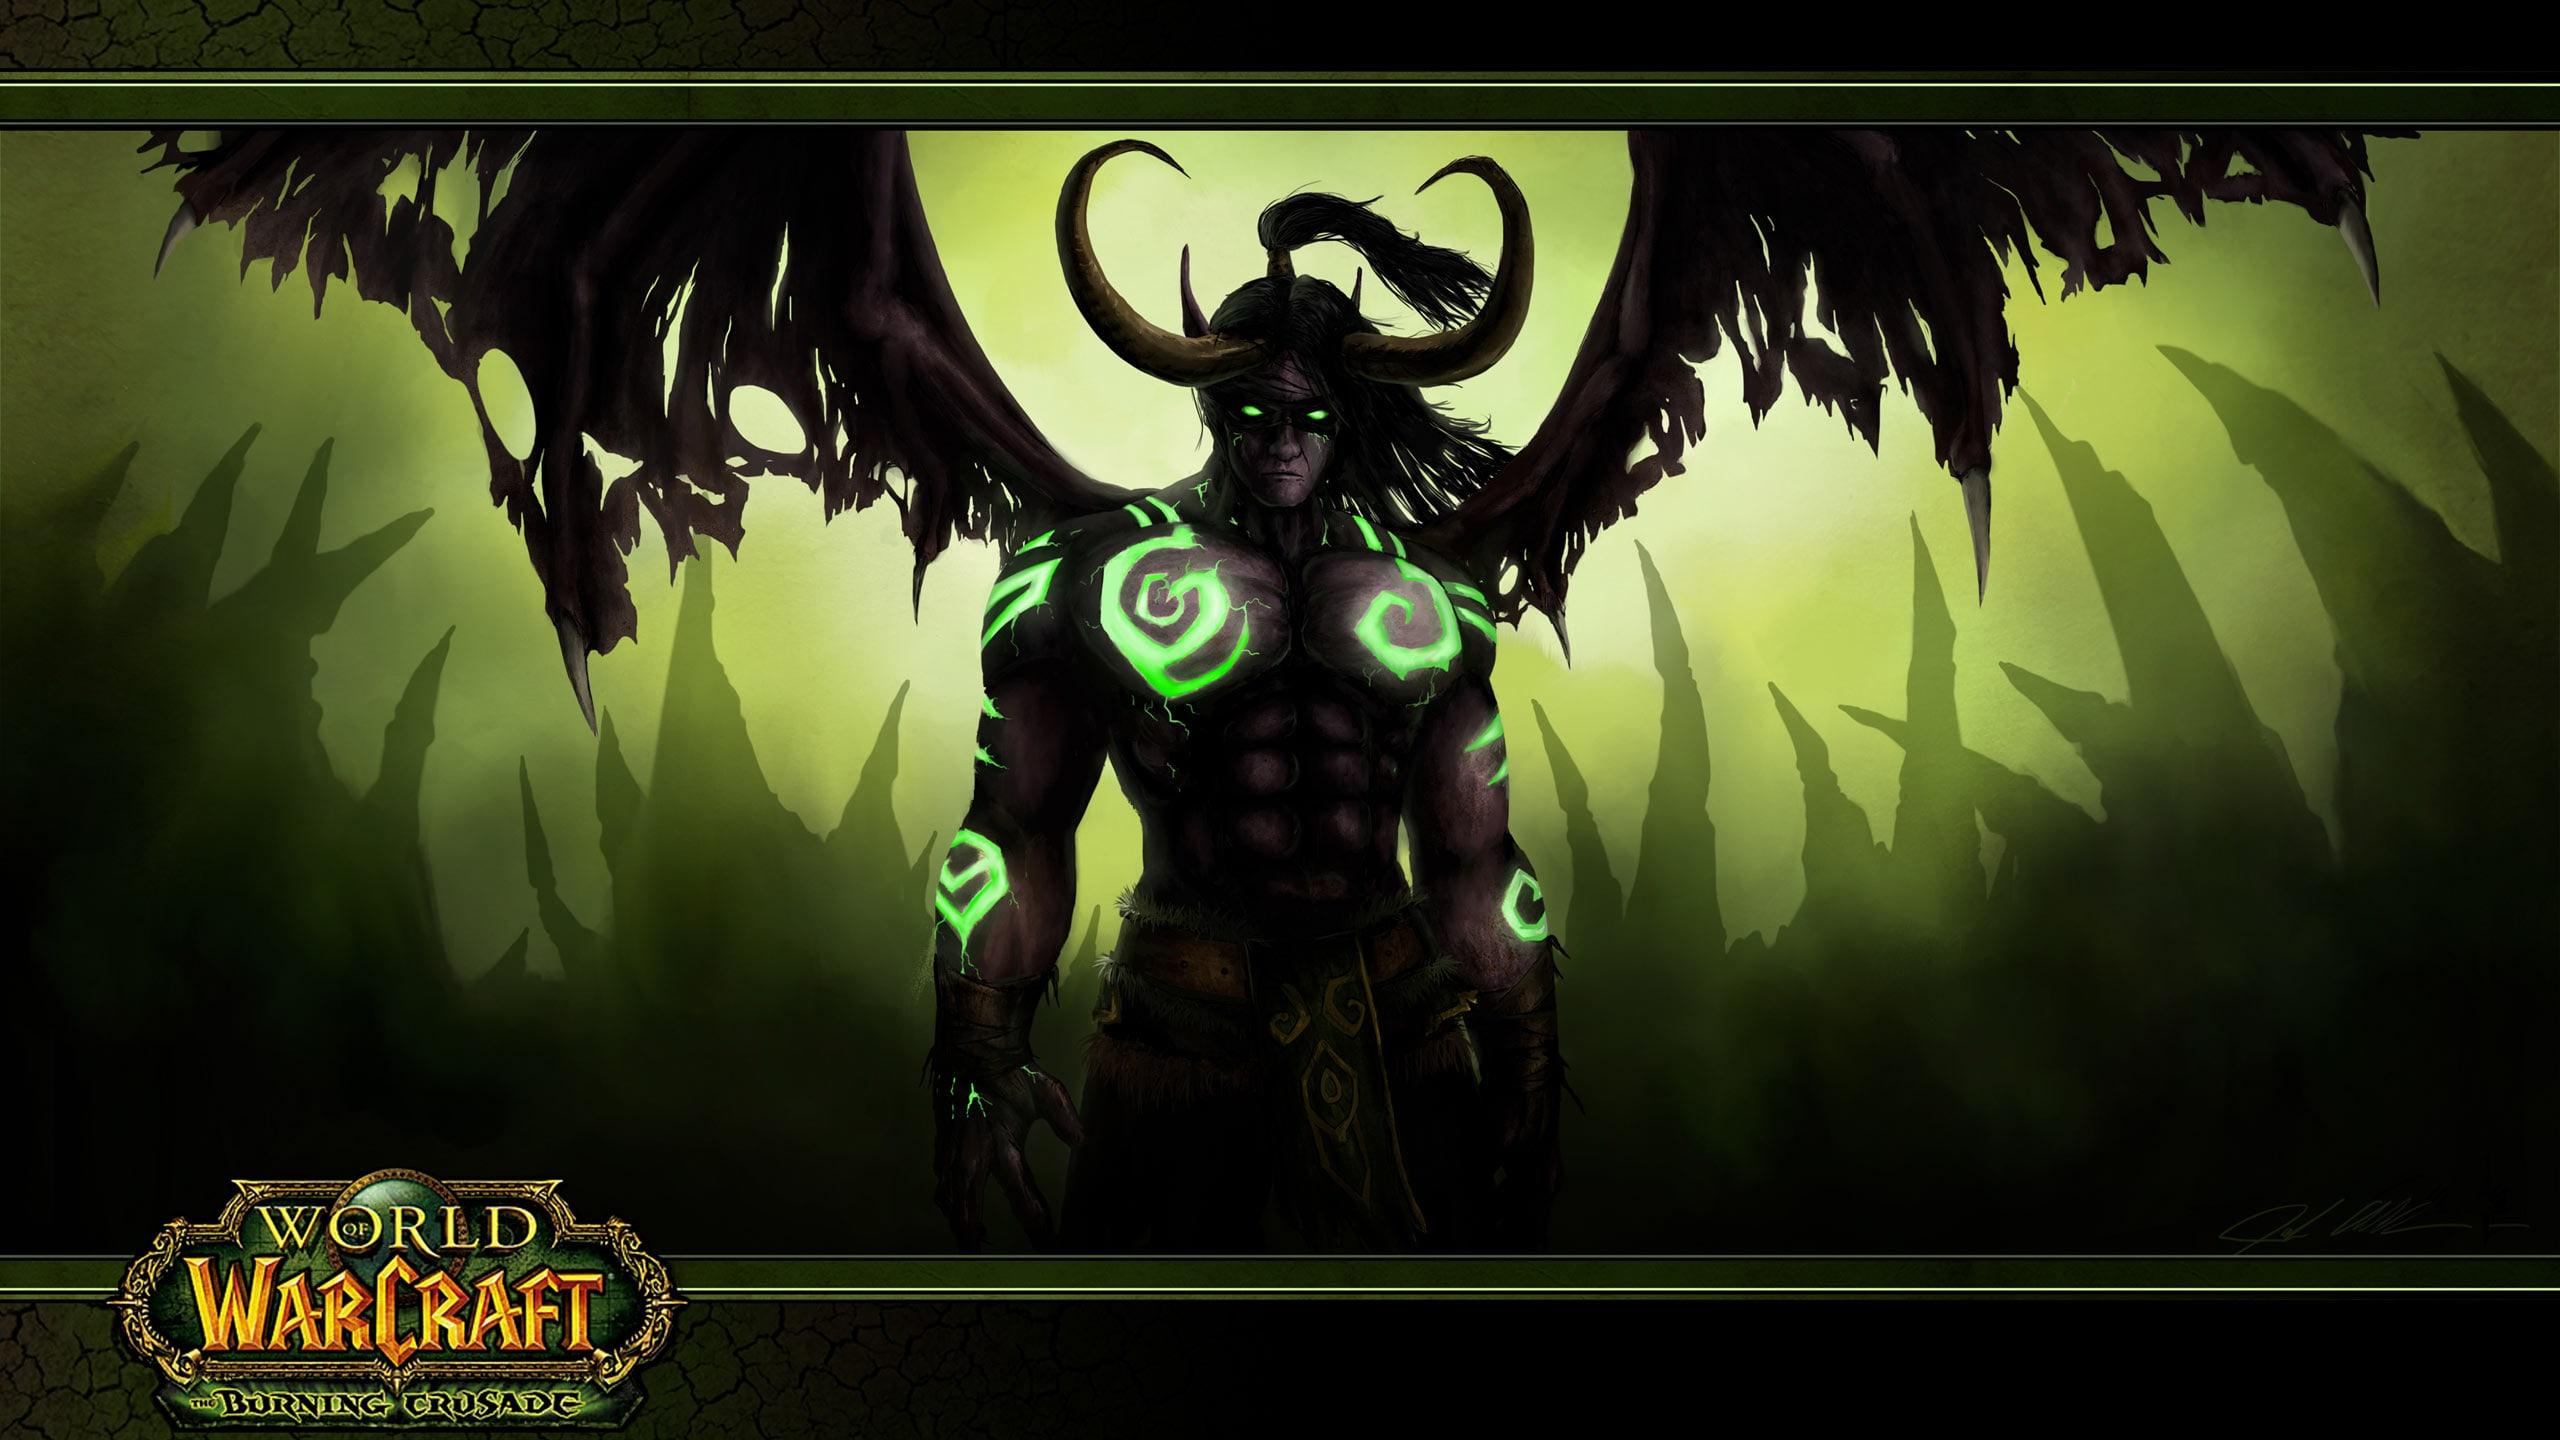 World Of Warcraft Legion Demon Hunter Draw Wallpaper 2560x1440 Download Hd Wallpaper Wallpapertip